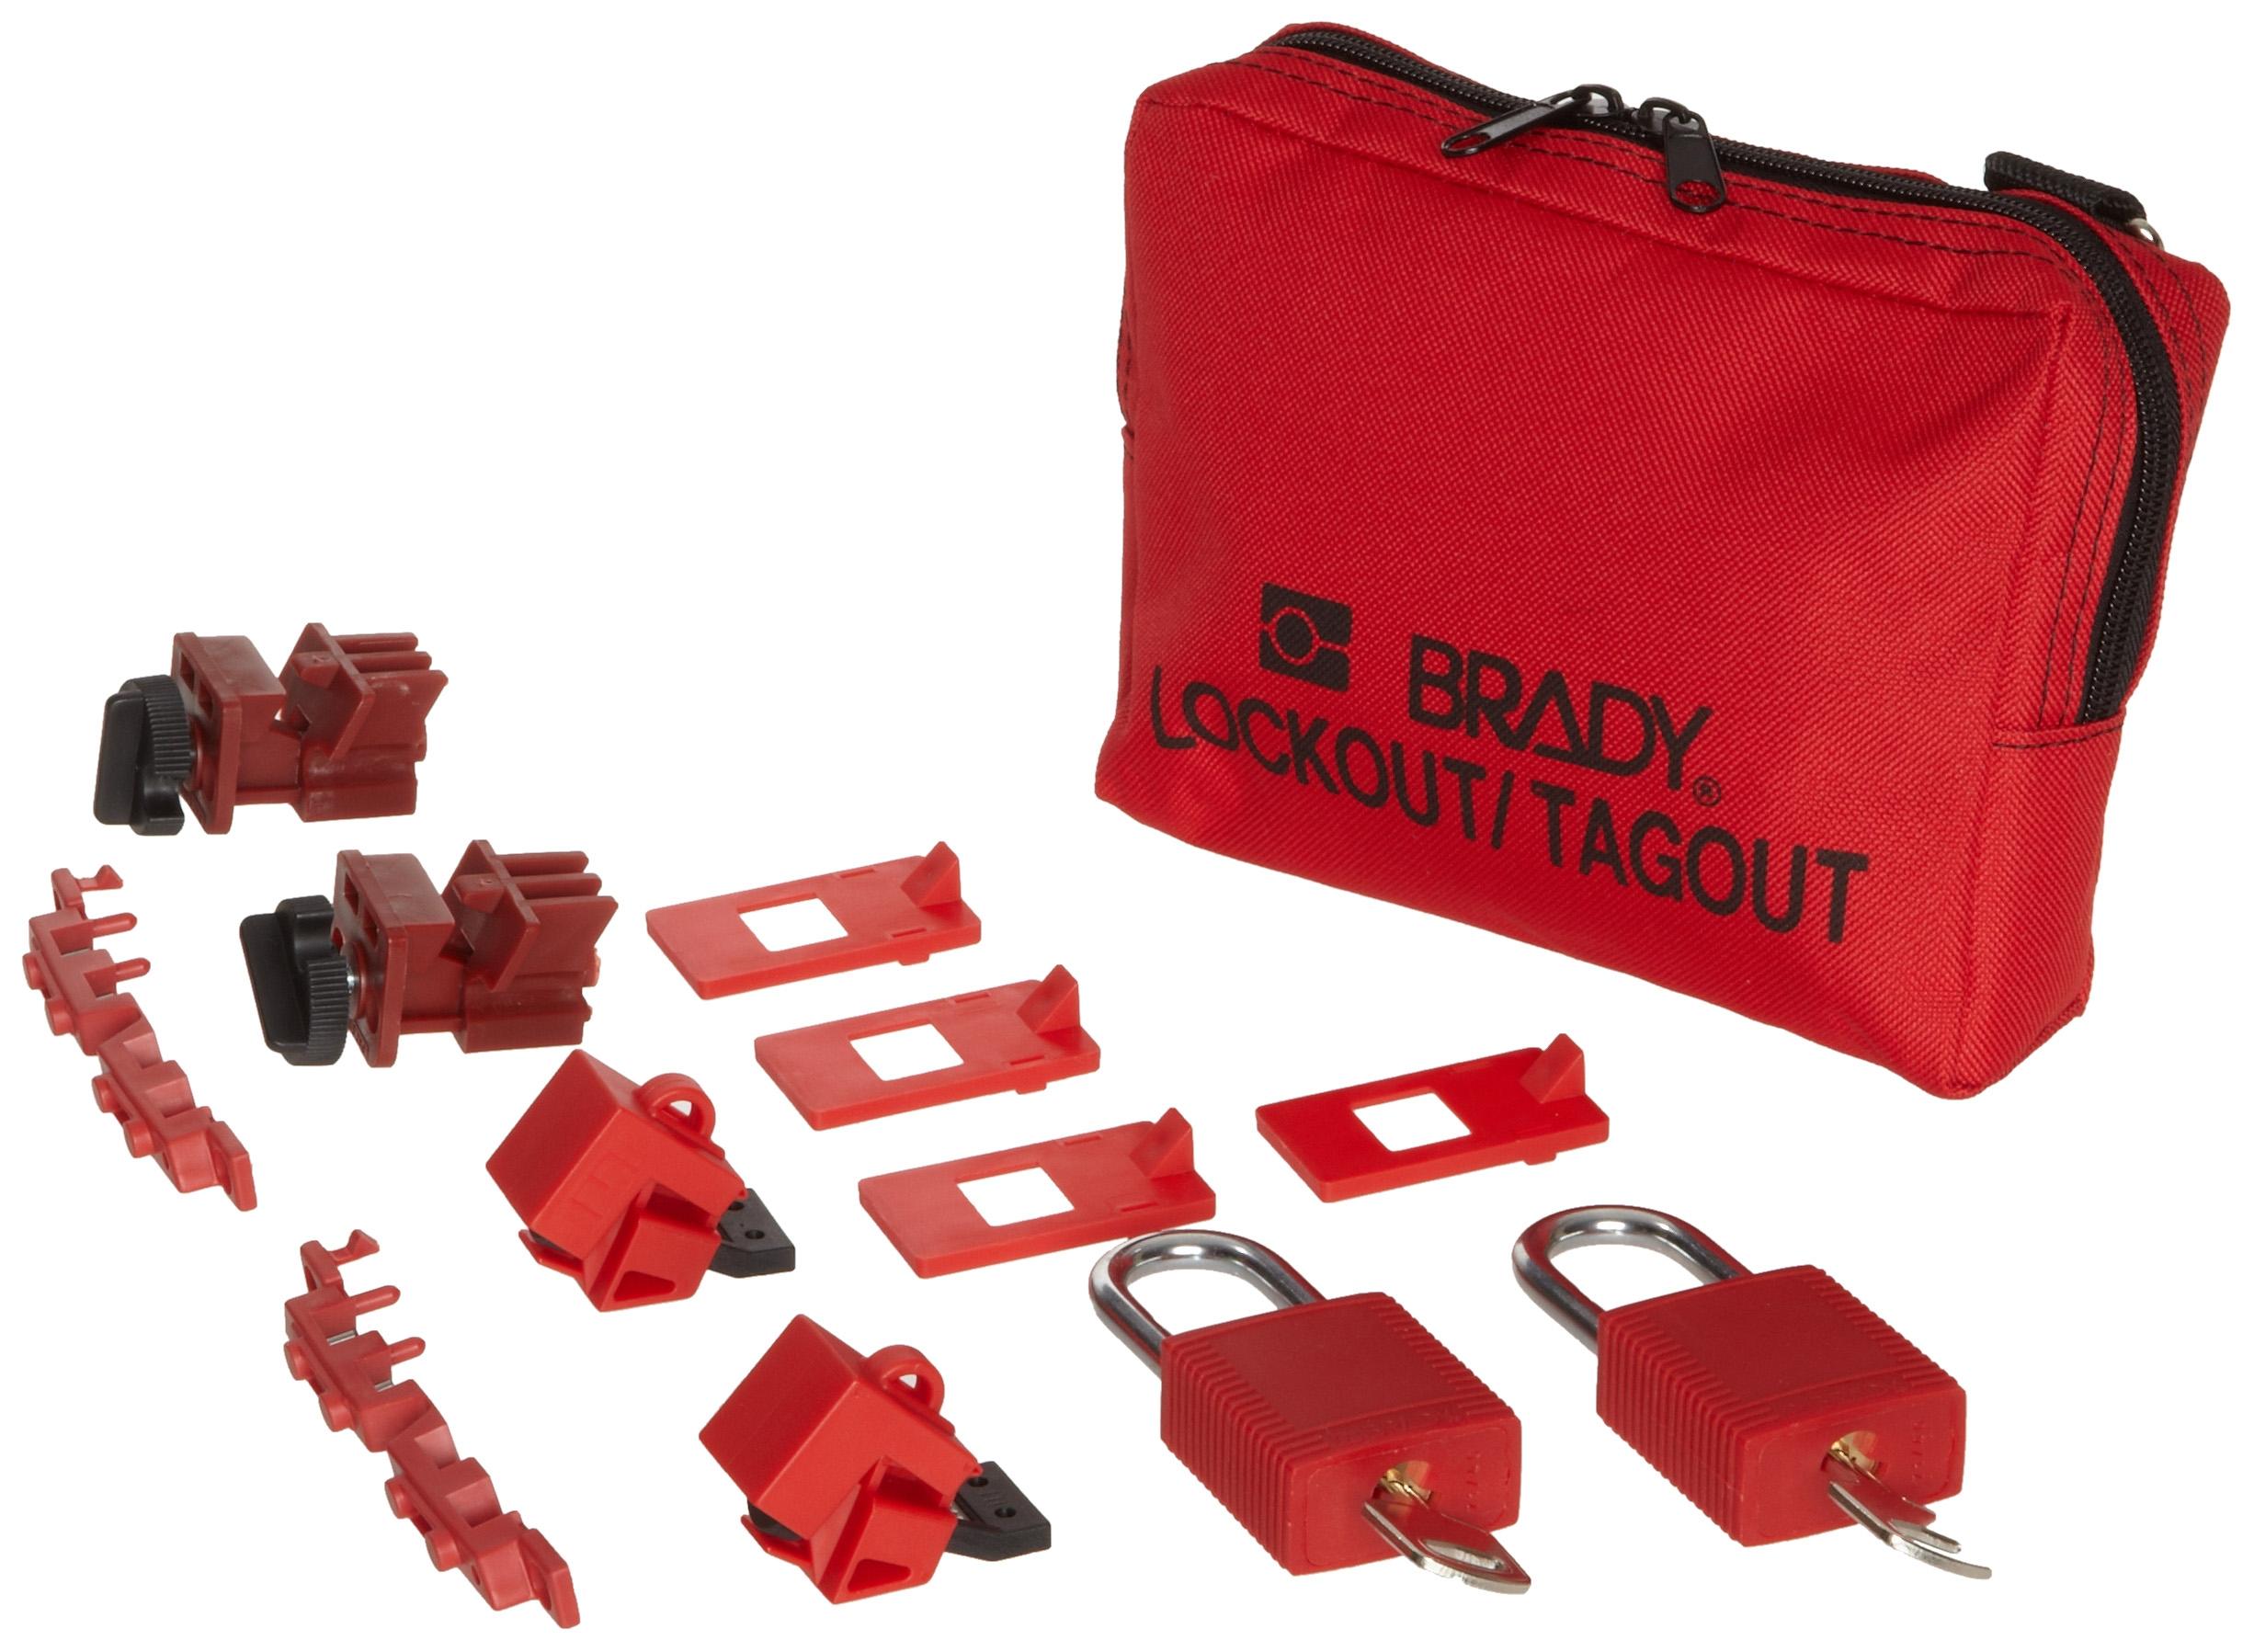 Brady 120/277V Breaker Lockout Pouch, Includes 2 Safety Padlocks and 2 Tags